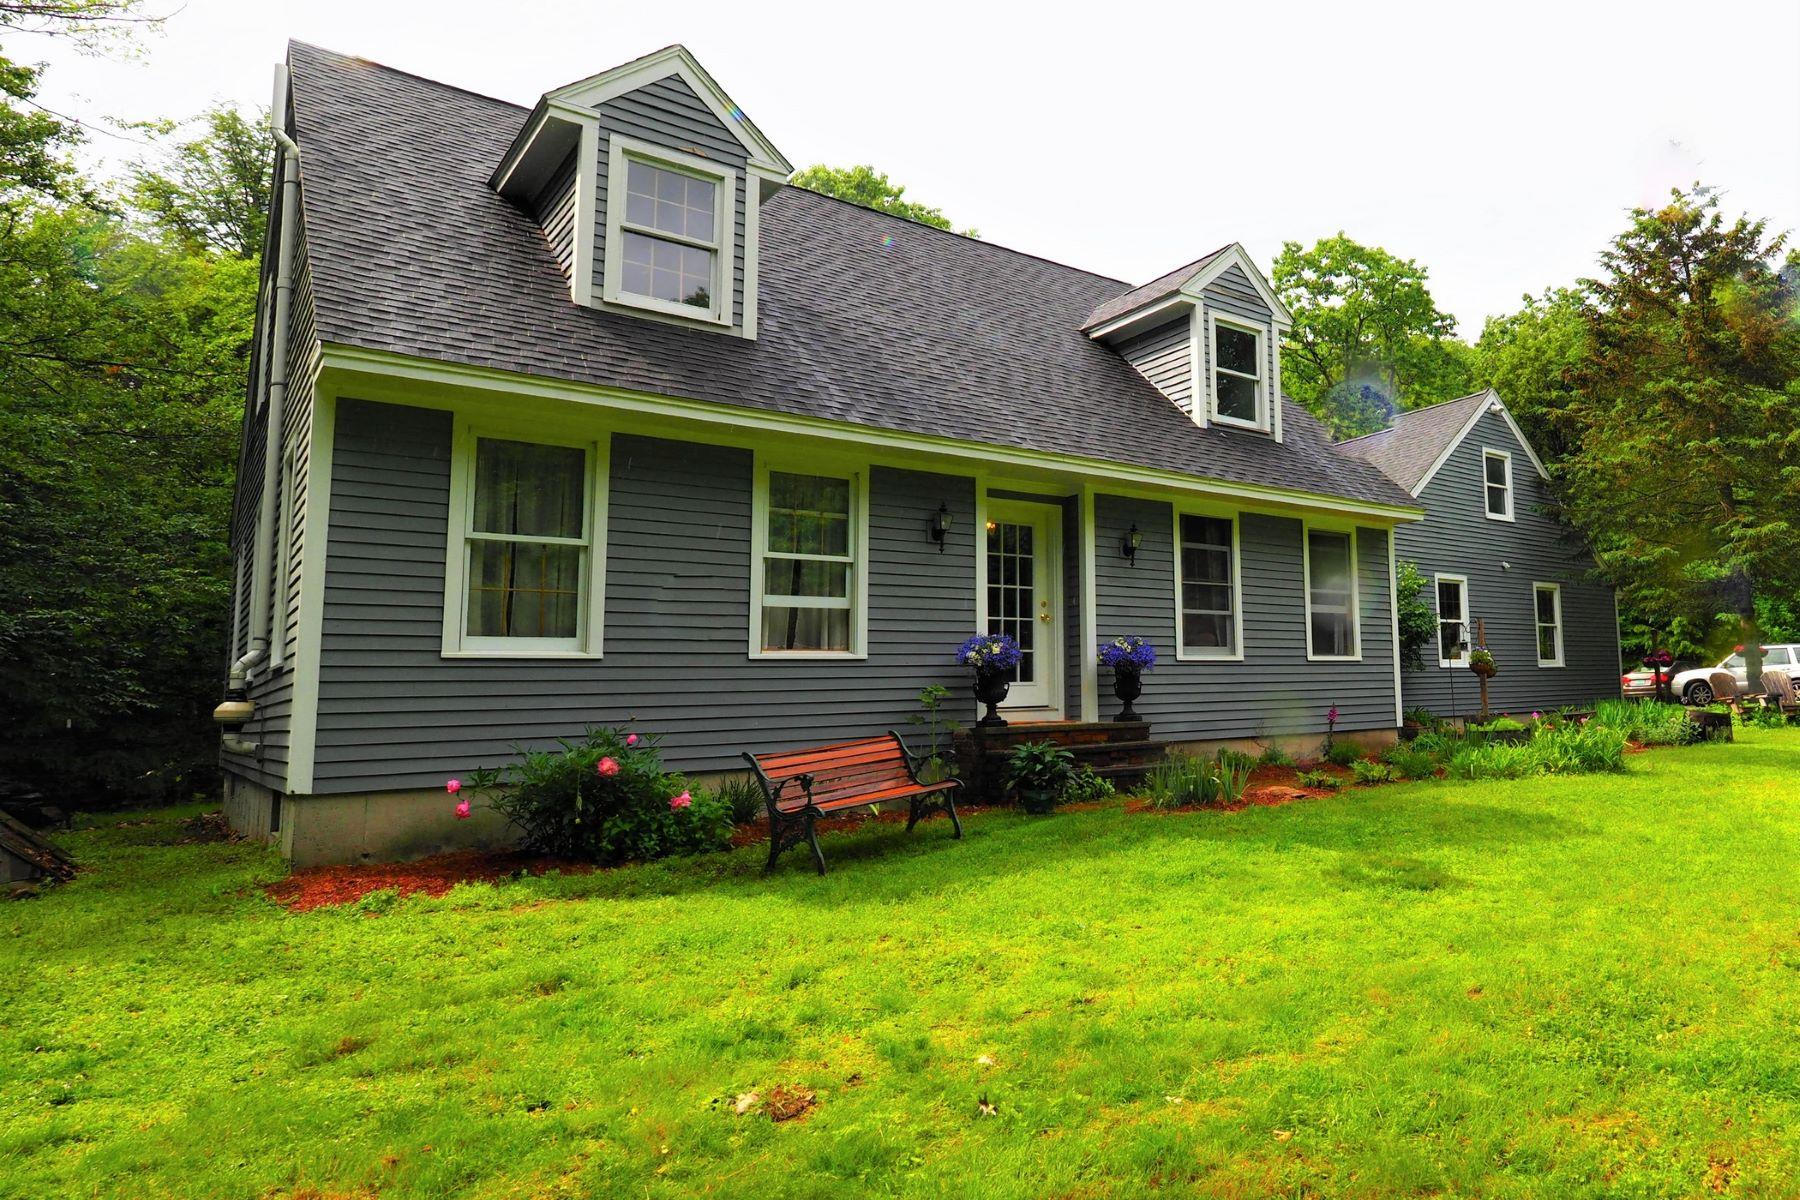 Single Family Homes for Sale at 25 Wagg Hill Rd. Ashburnham, Massachusetts 01430 United States